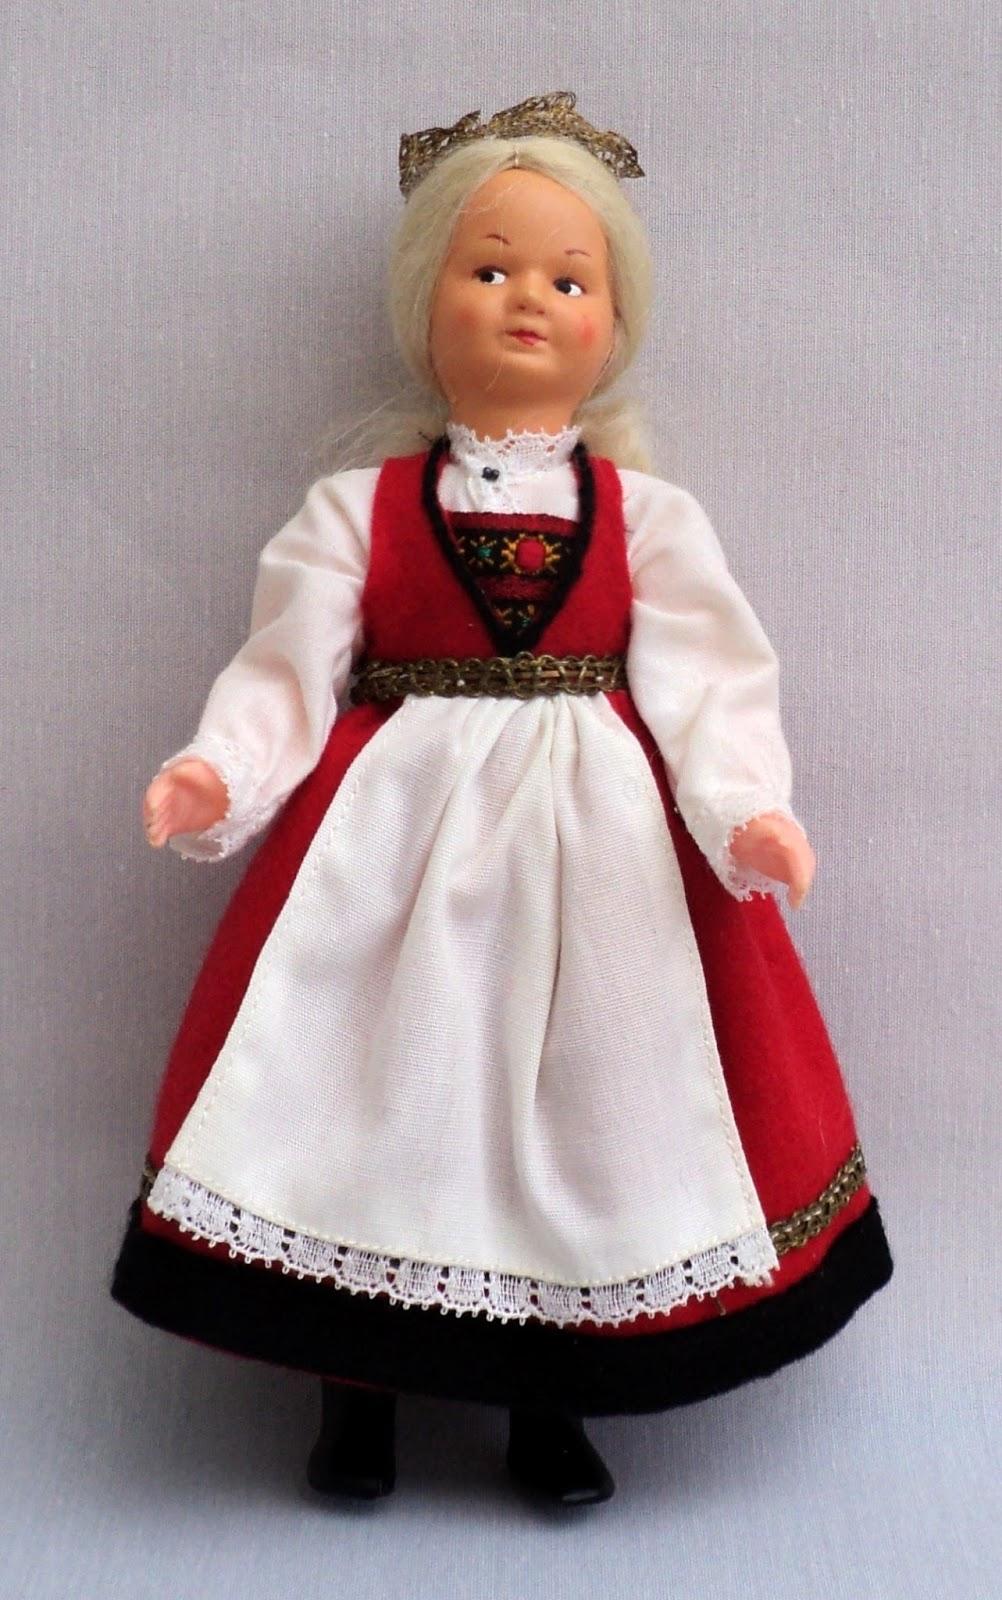 World Costume Dolls: WORLD COSTUME DOLLS FROM NORWAY ...